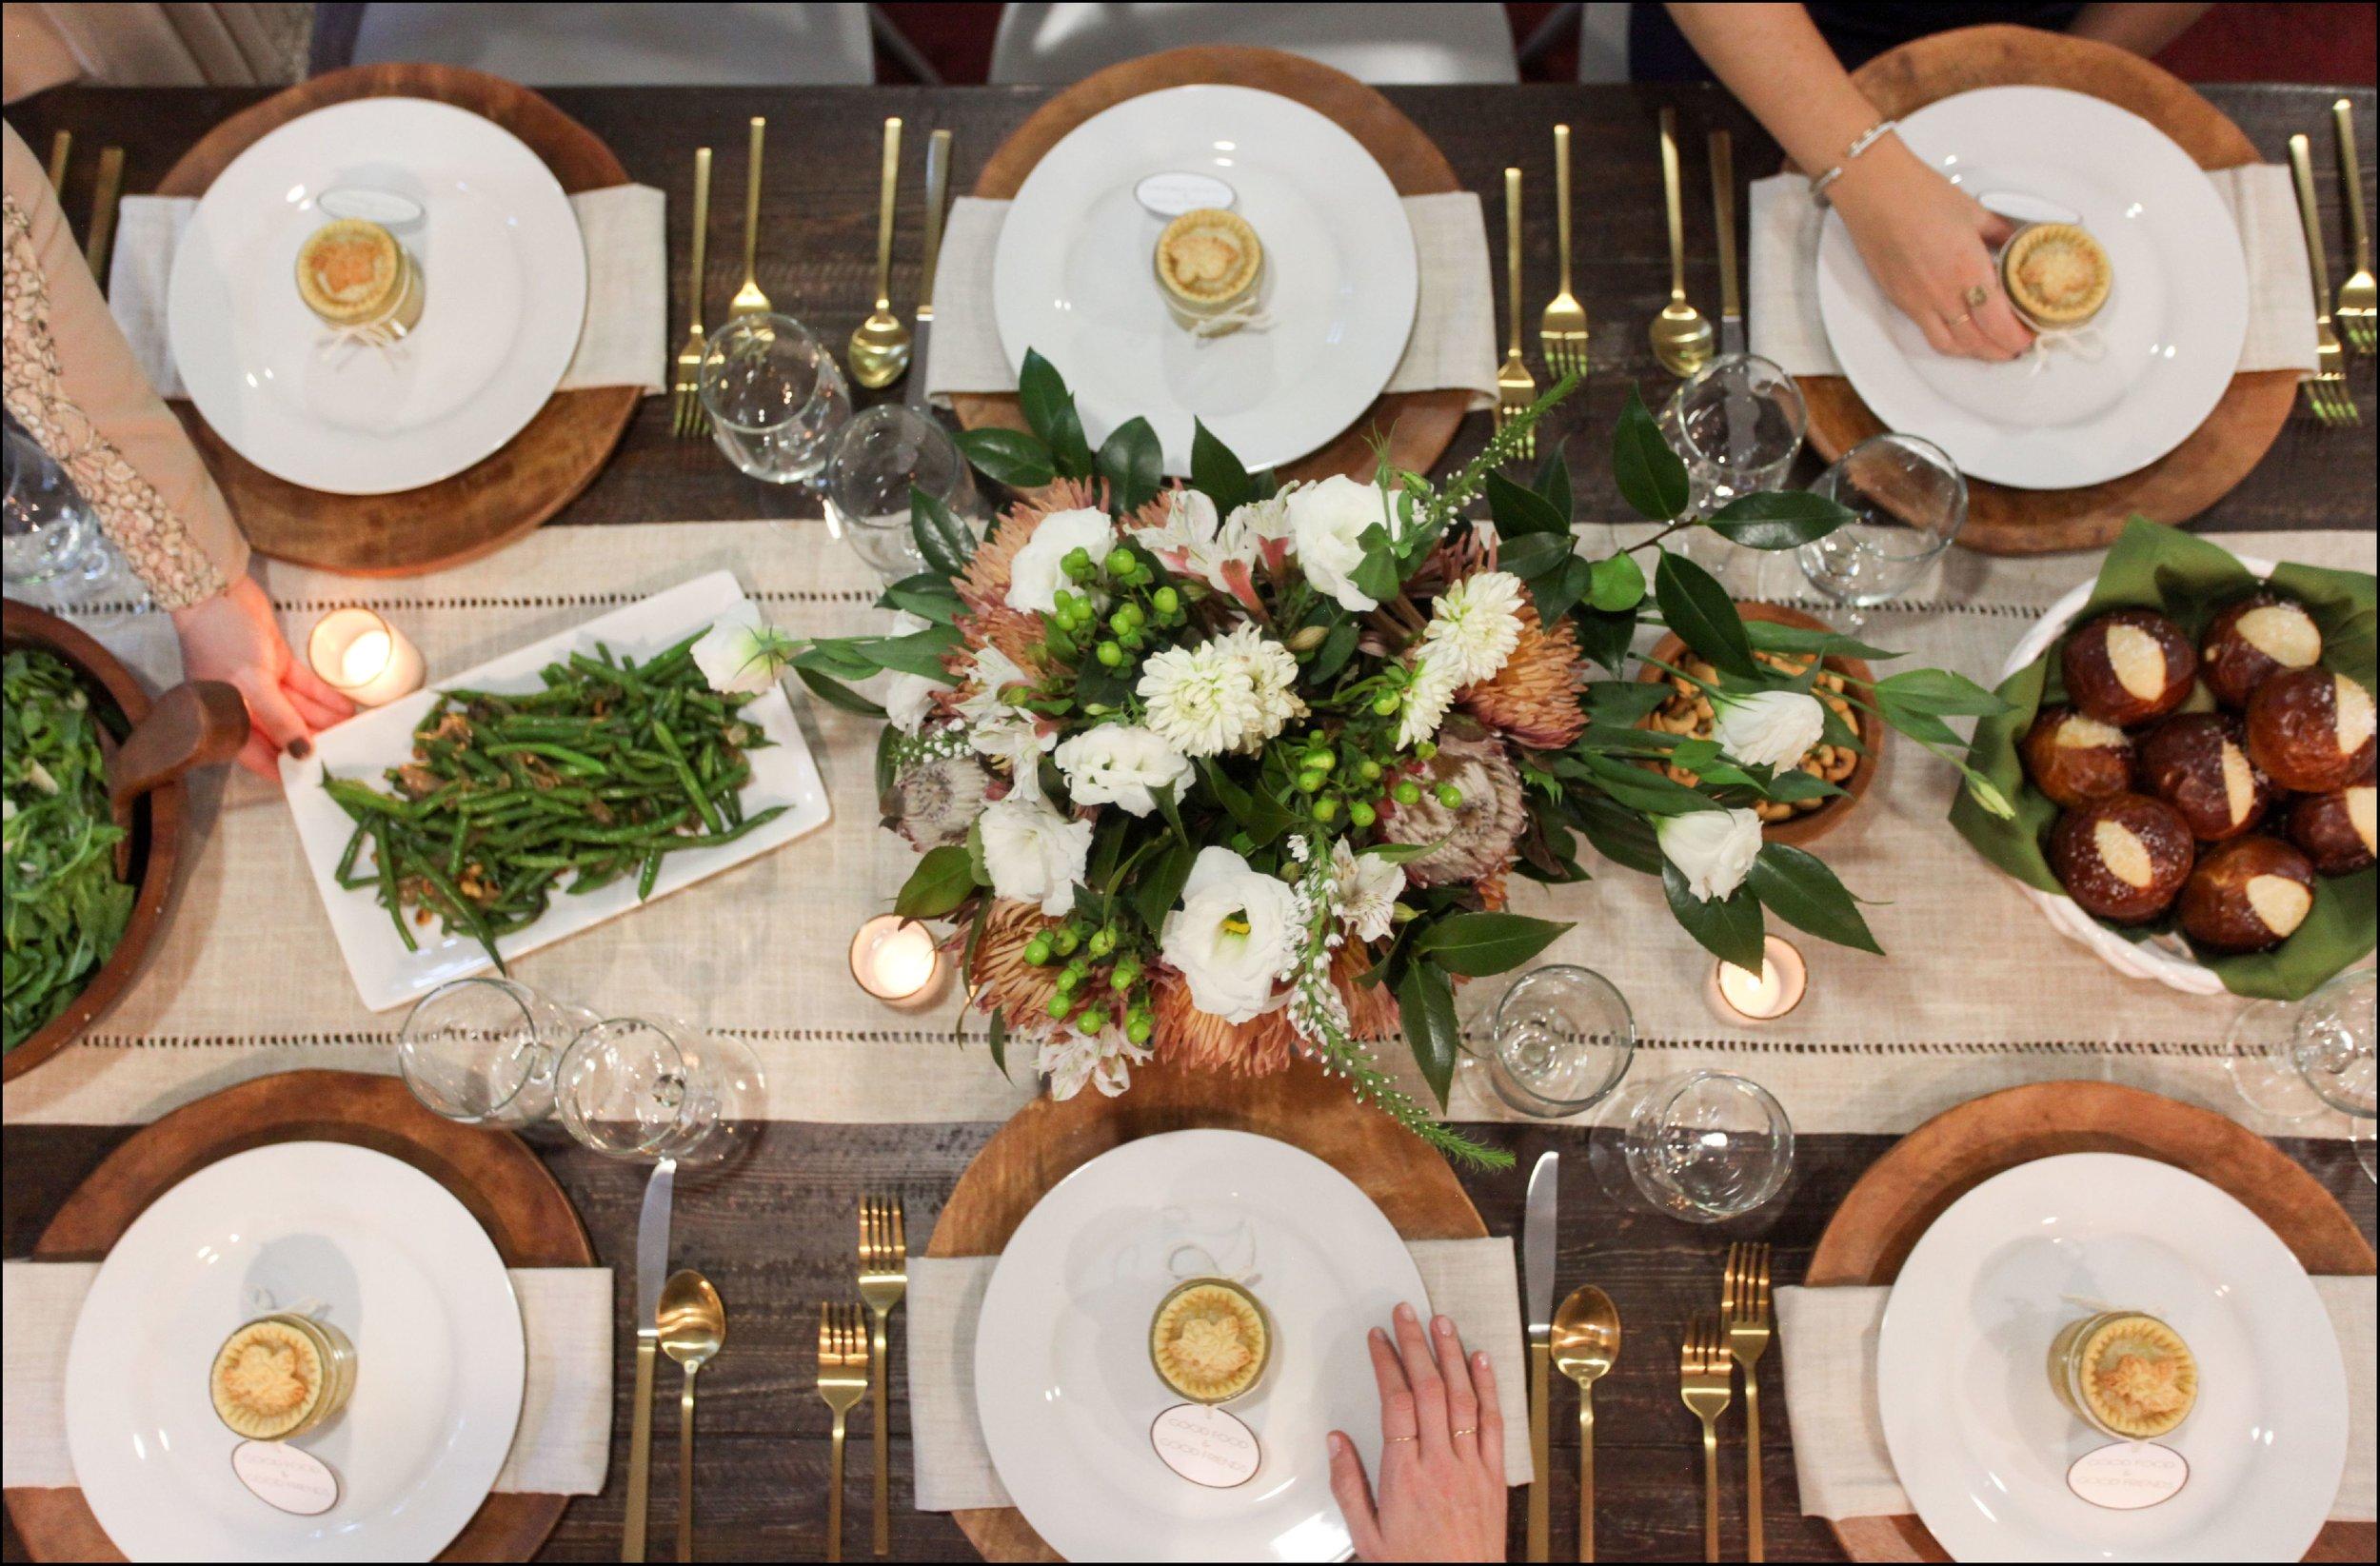 wonderfull-how-to-host-a-gratitude-dinner-evite-with-dinner-party-table-ideas.jpg